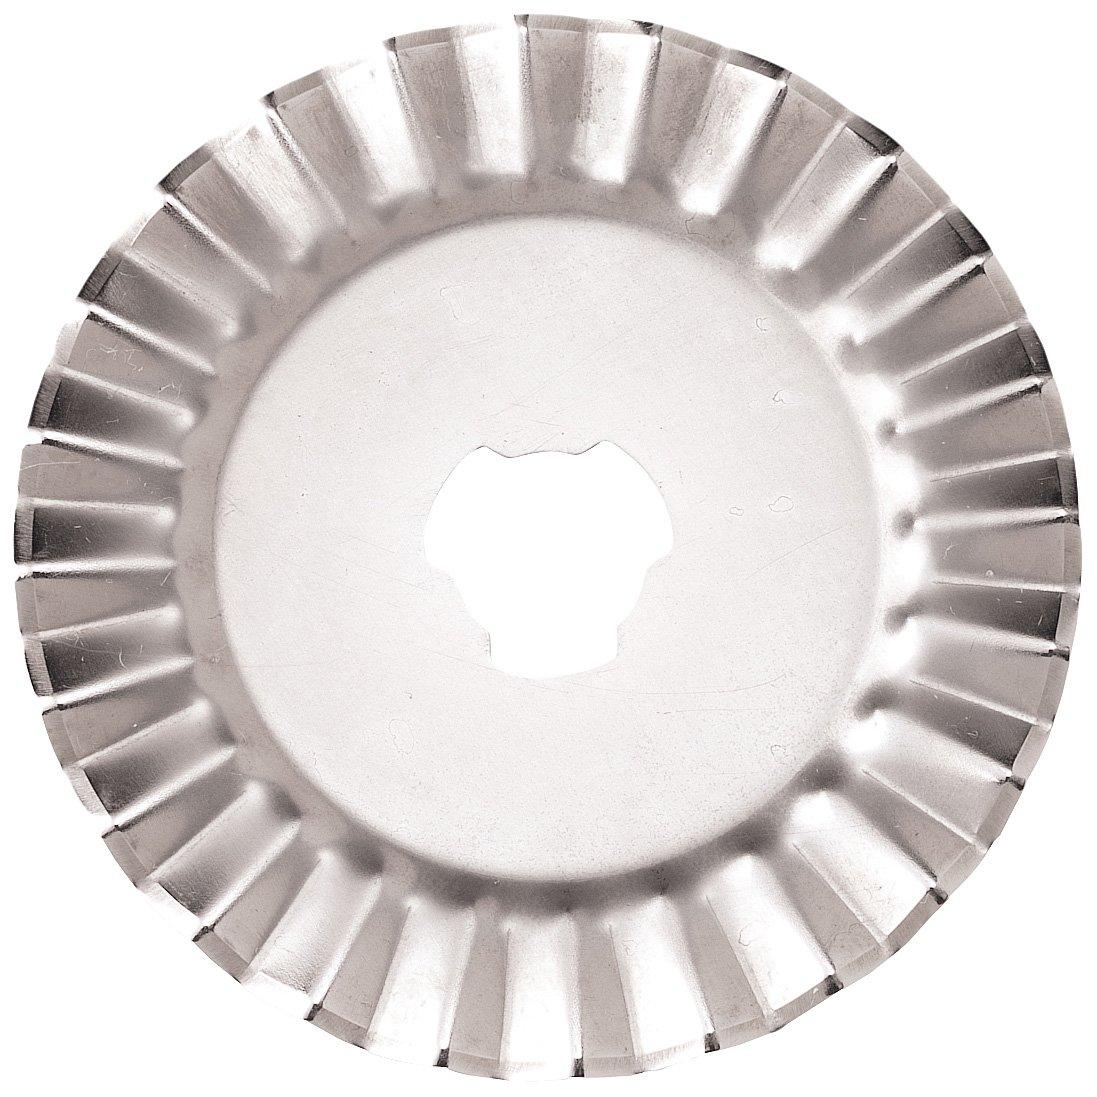 Fiskars 93518097J Decorative Rotary Replacement Pinking Blade, 45mm